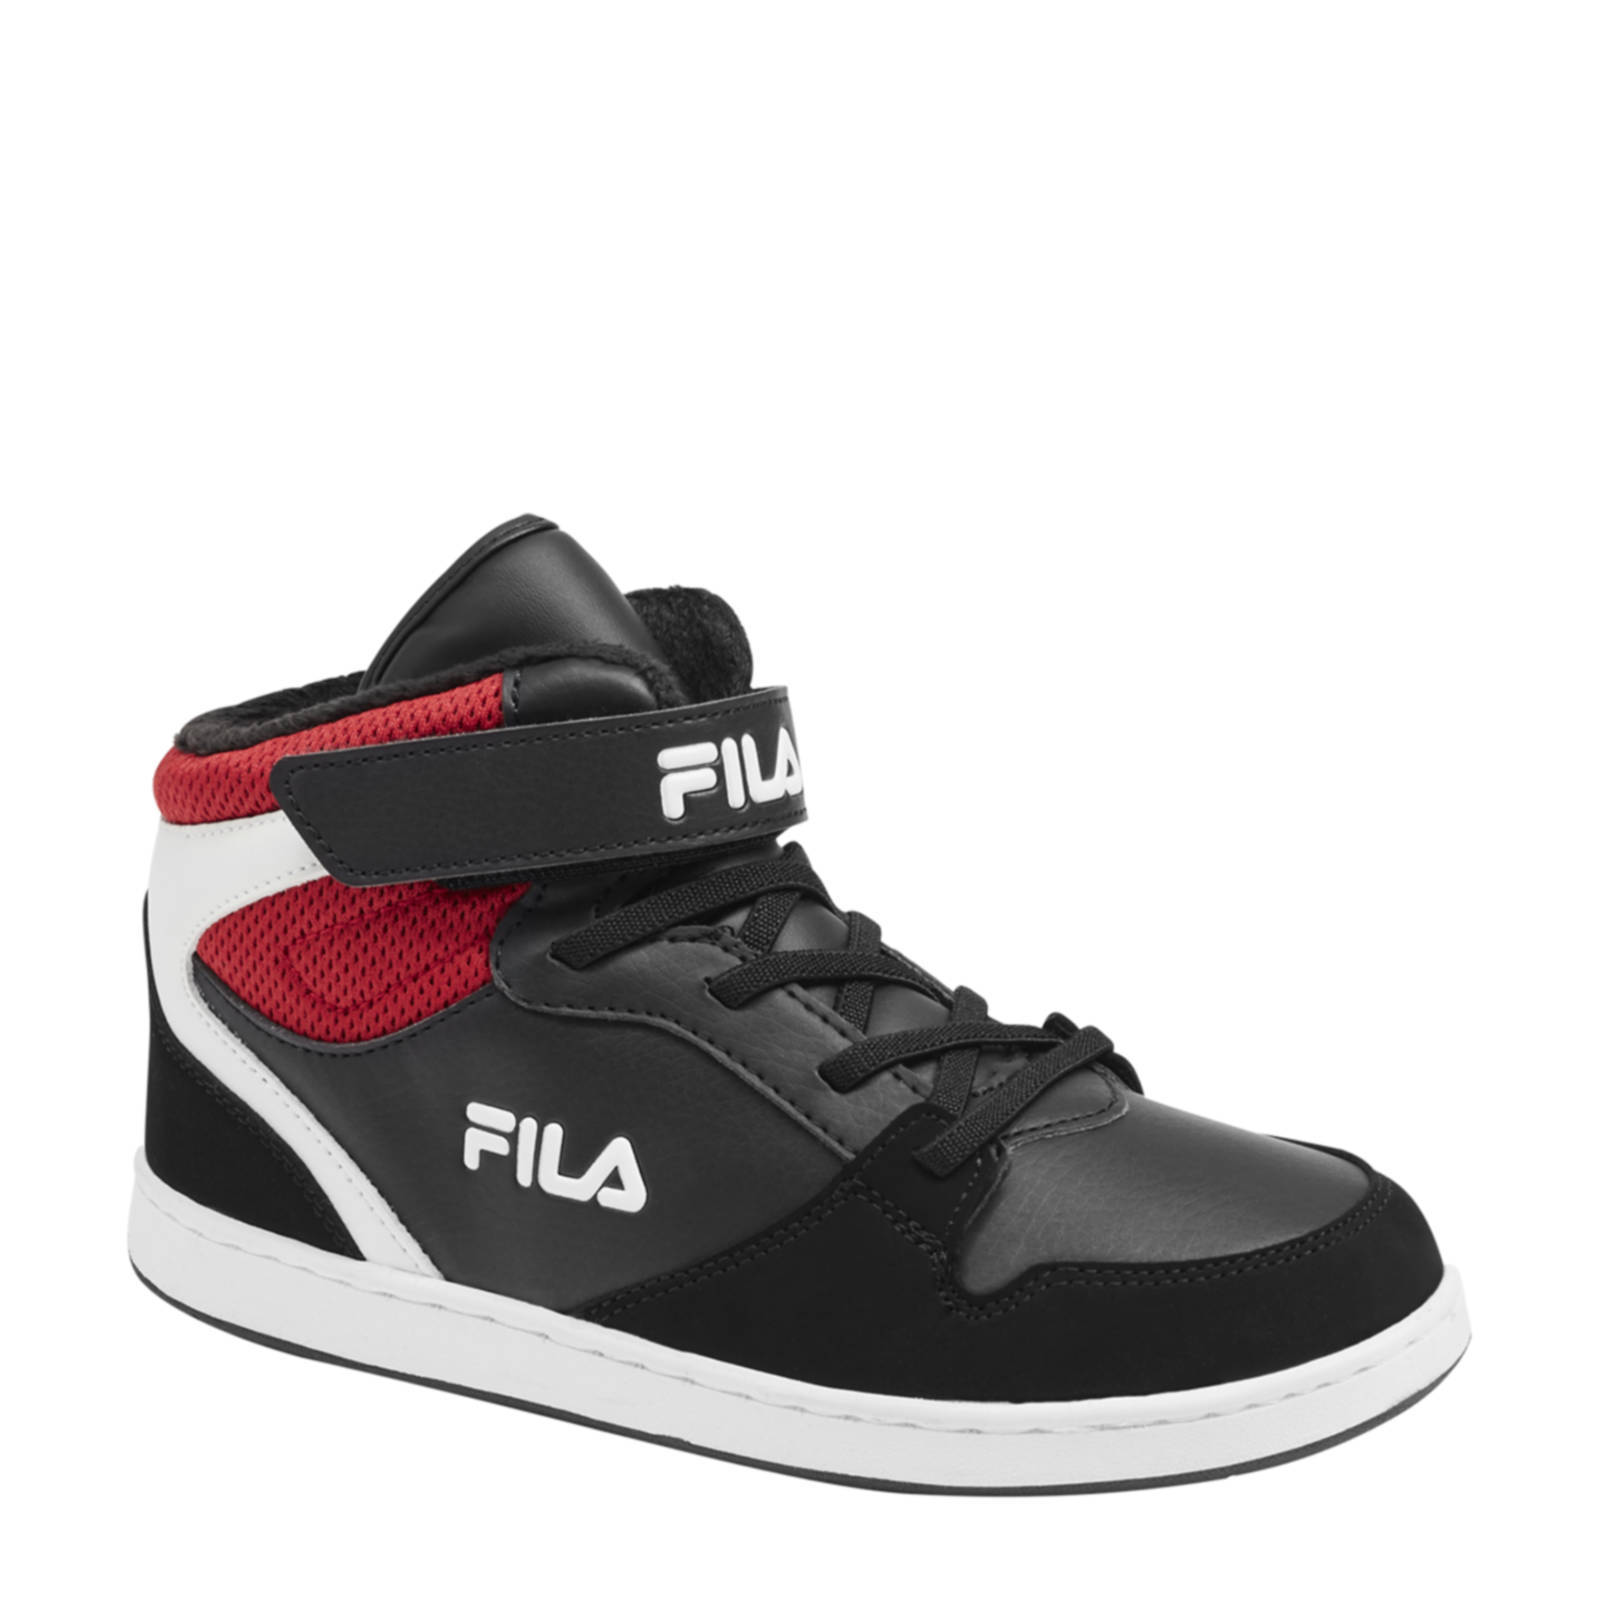 Fila hoge sneakers zwart/rood | wehkamp